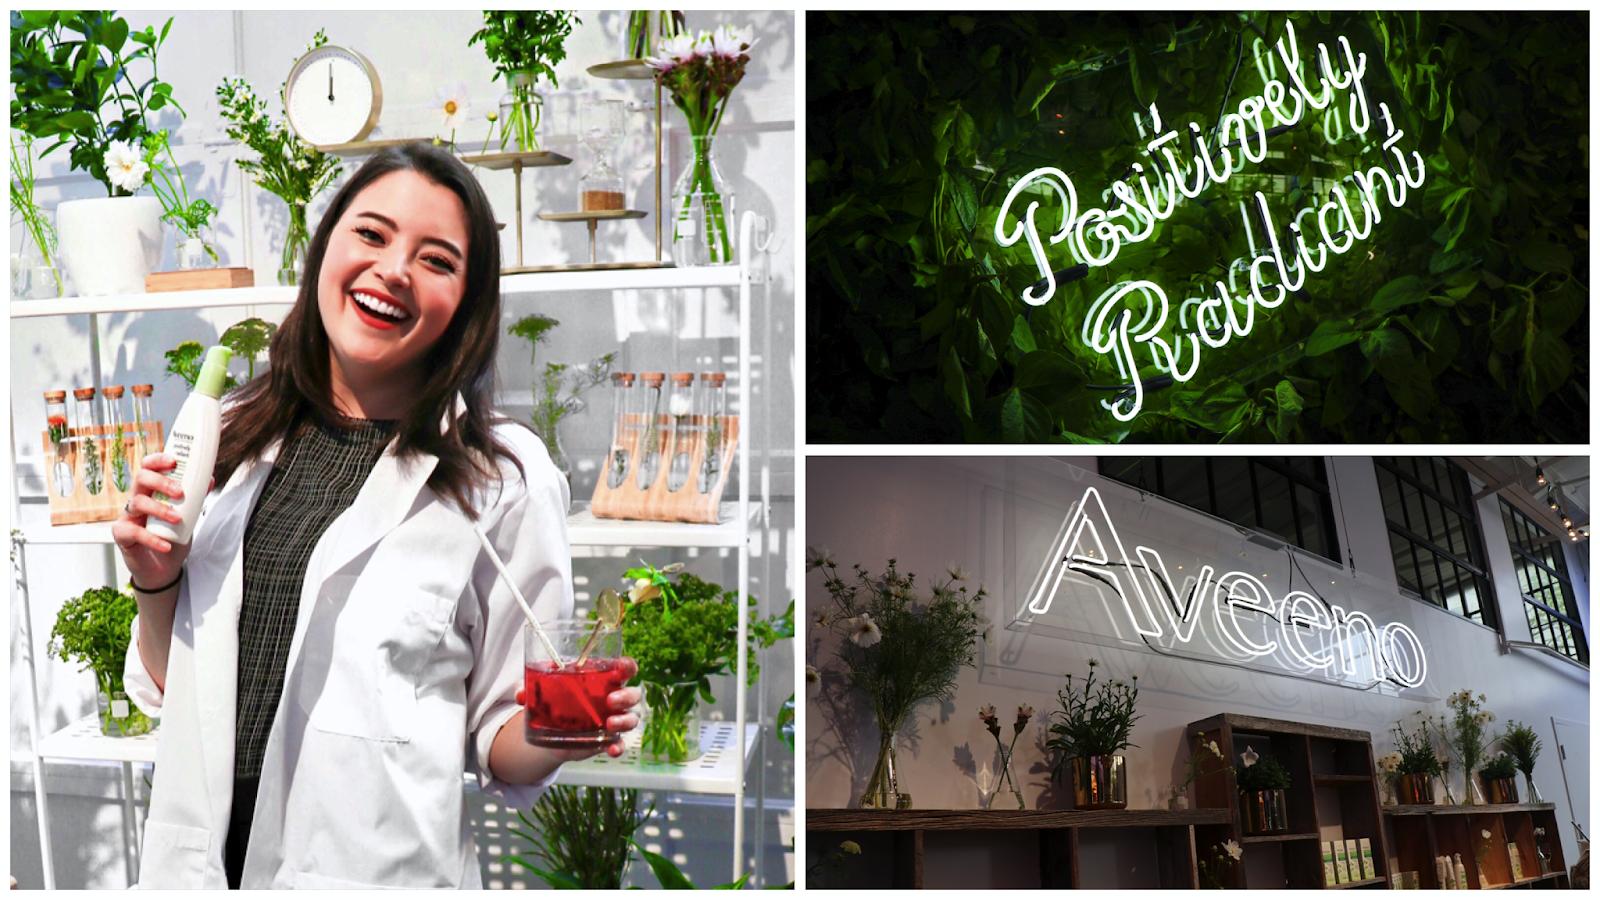 Aveeno Positively Radiant Skincare Drugstore Line